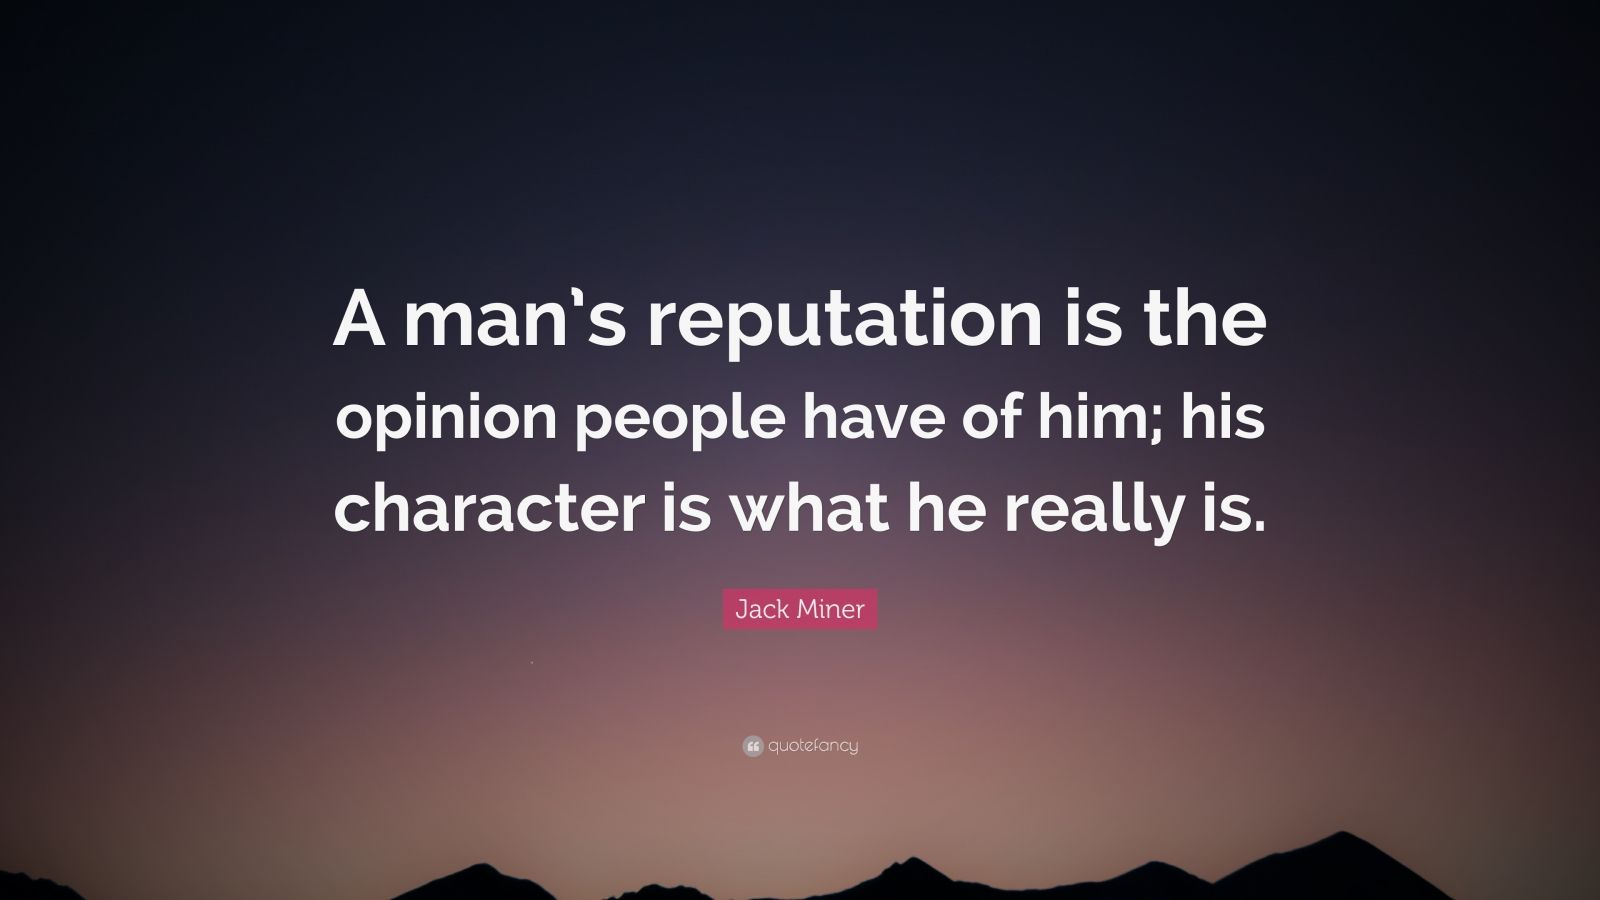 Jack Milner quote